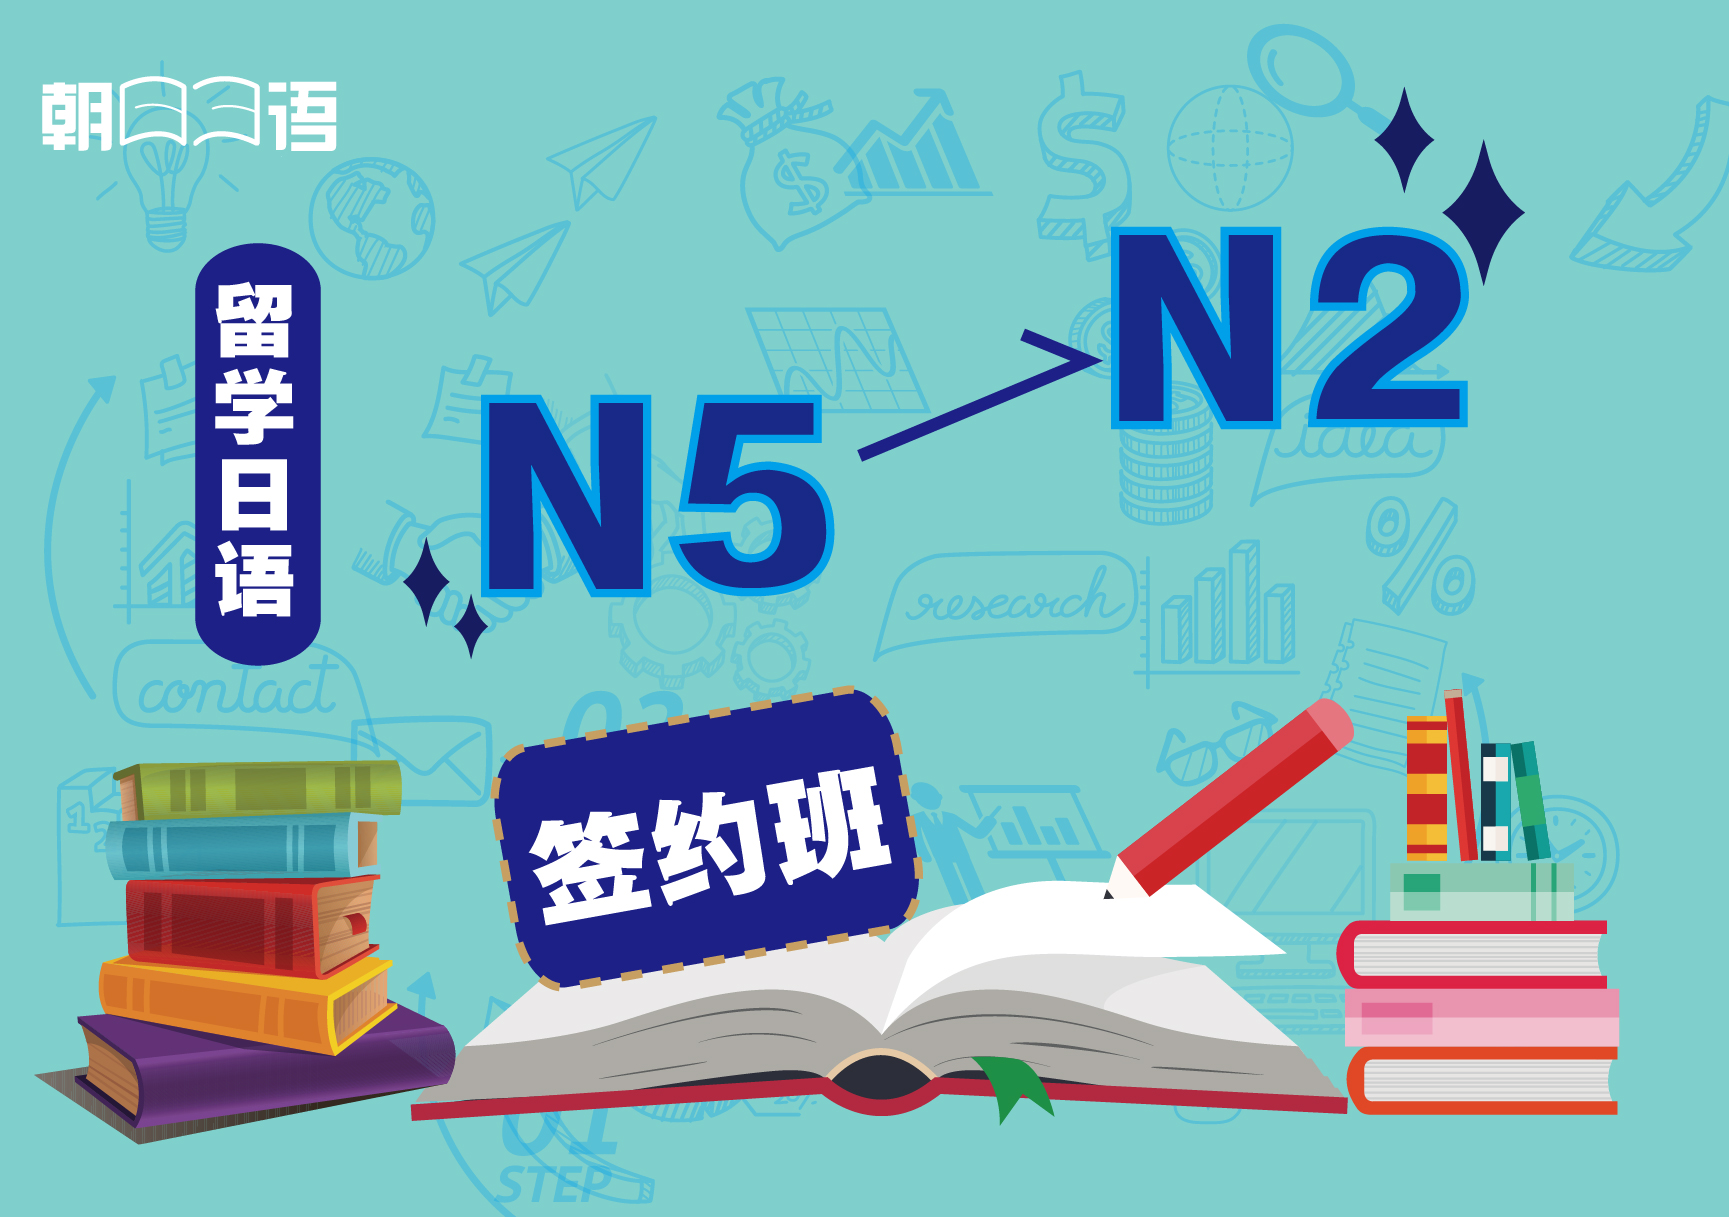 n5-n2留学签约班-01.jpg